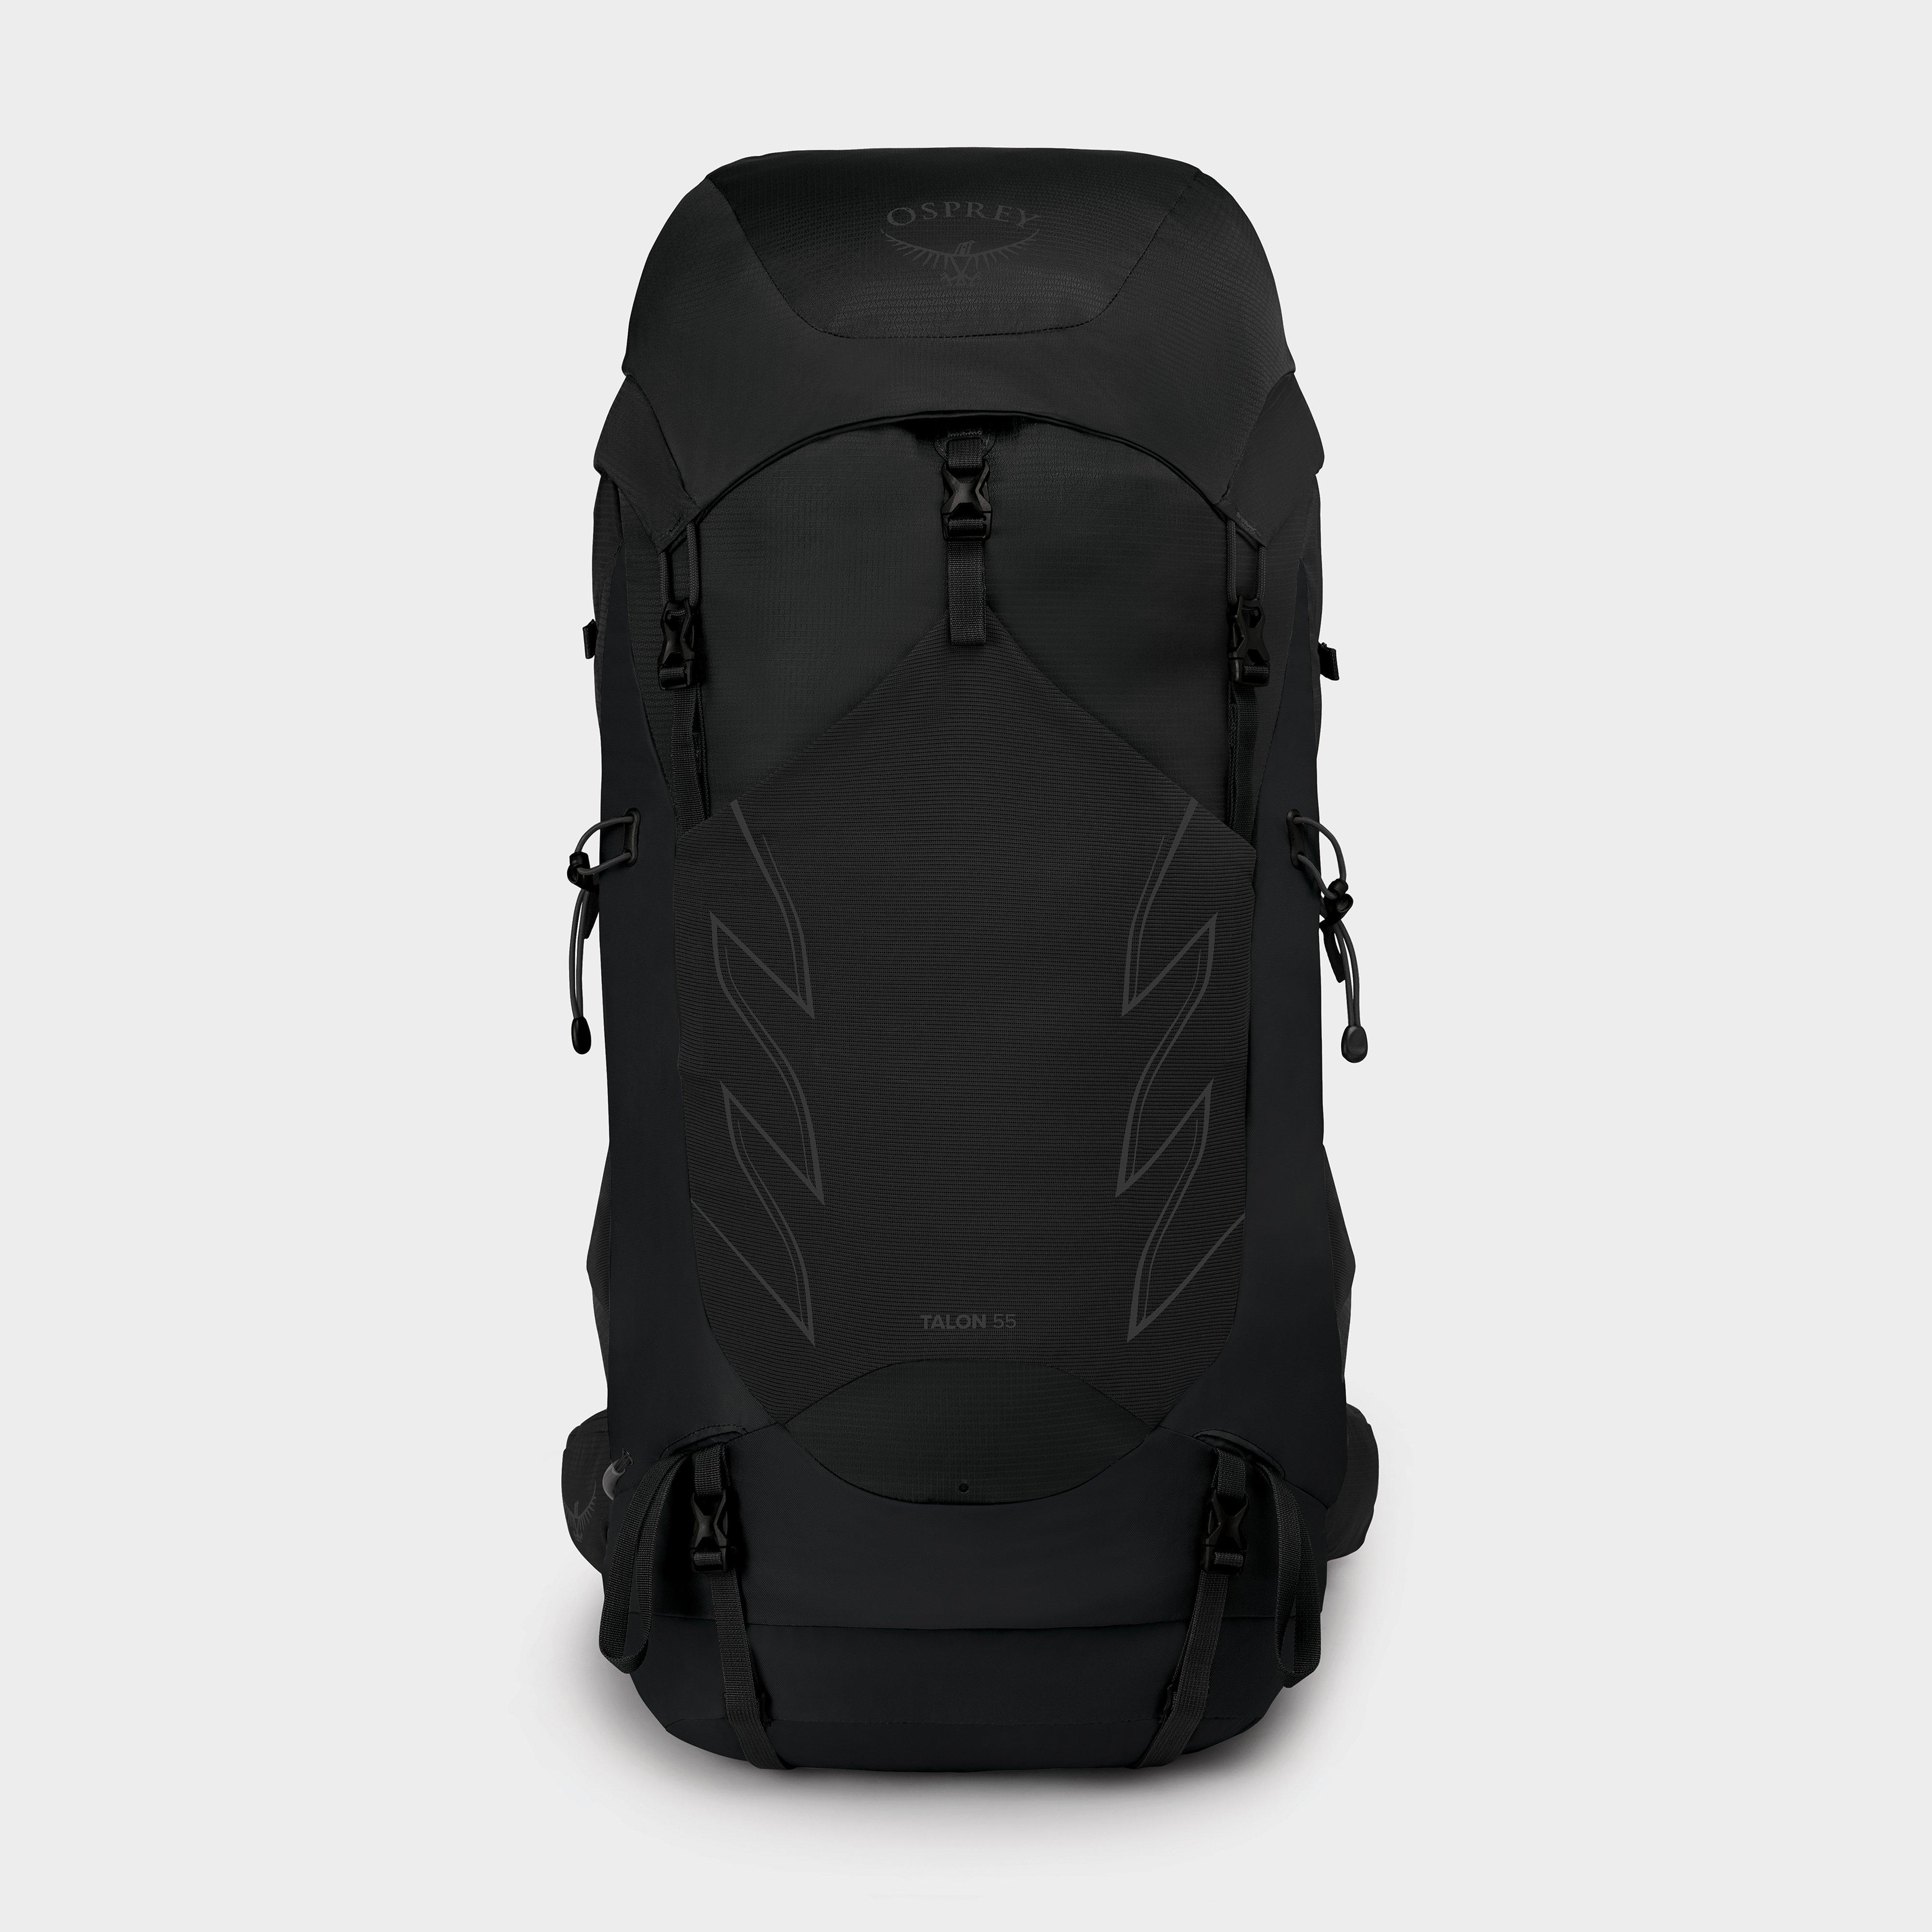 Osprey Talon 55 Daypack - Black/Black, Black